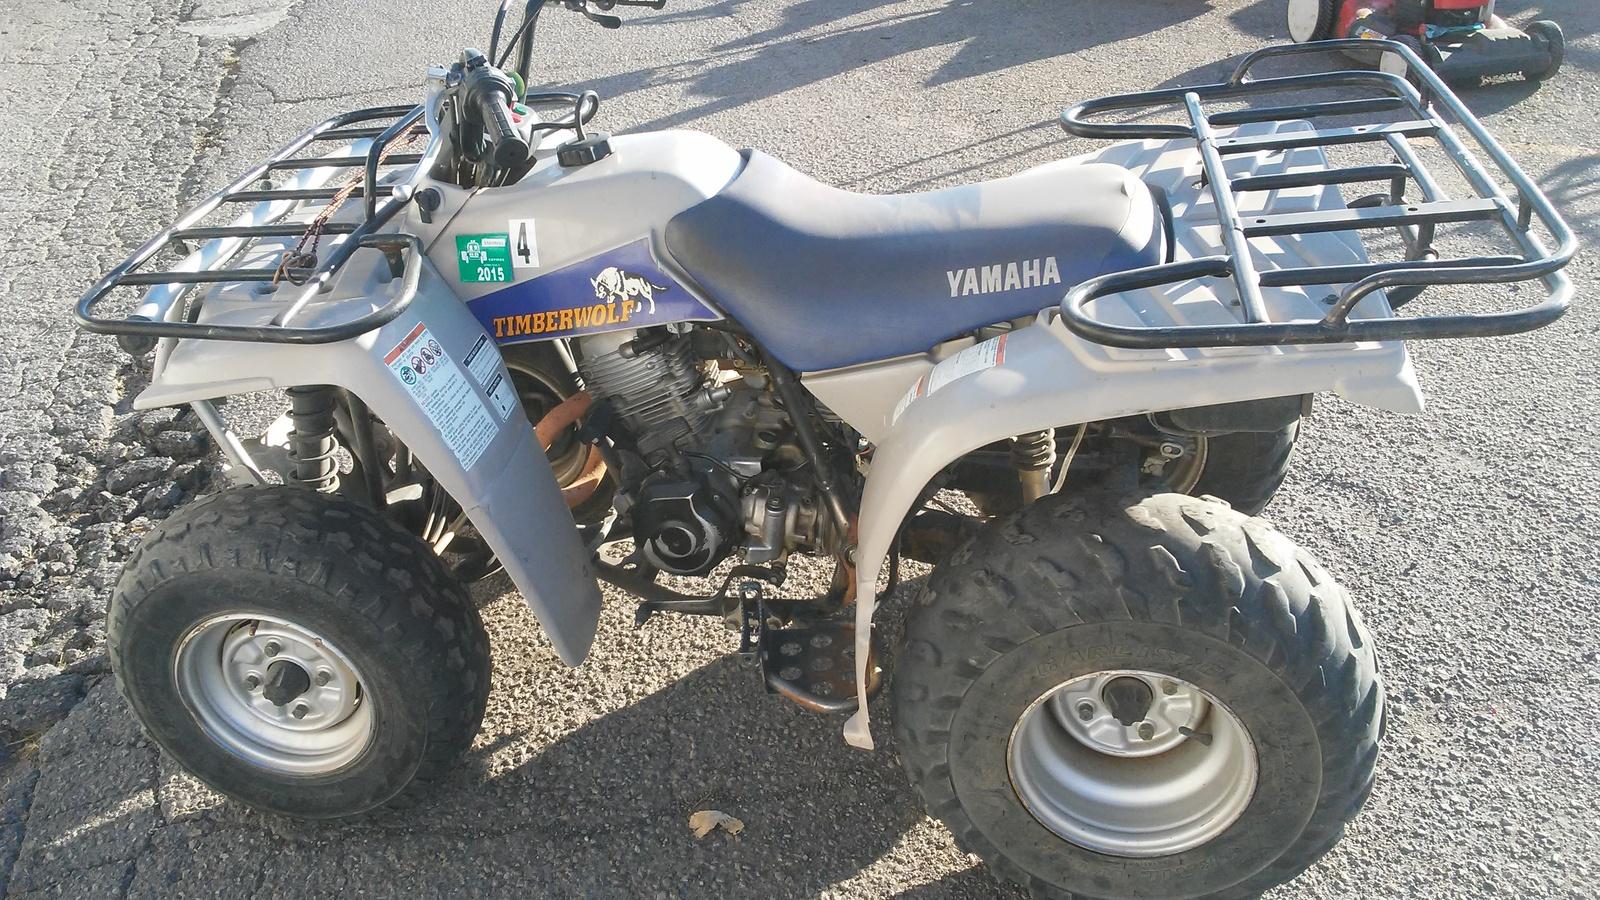 Replaces 98 Yamaha Timber Wolf YFB250U Oil and 24 similar items